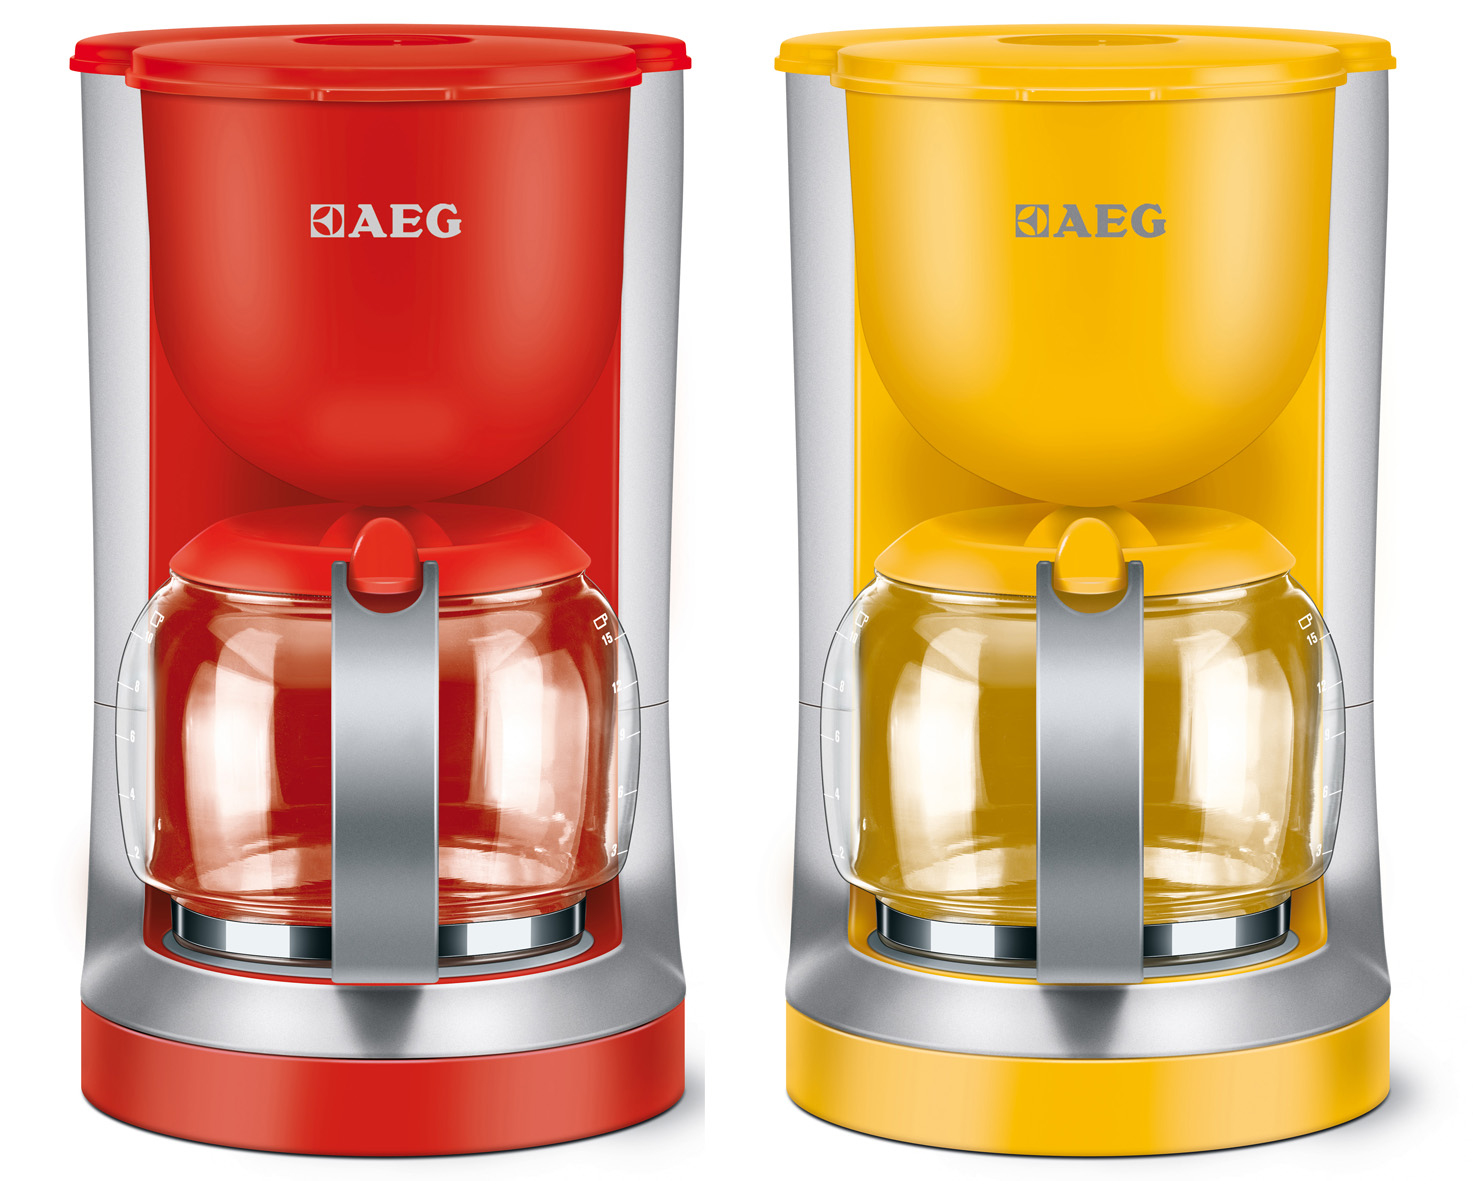 aeg go colour kaffeemaschine in poppigen farben. Black Bedroom Furniture Sets. Home Design Ideas